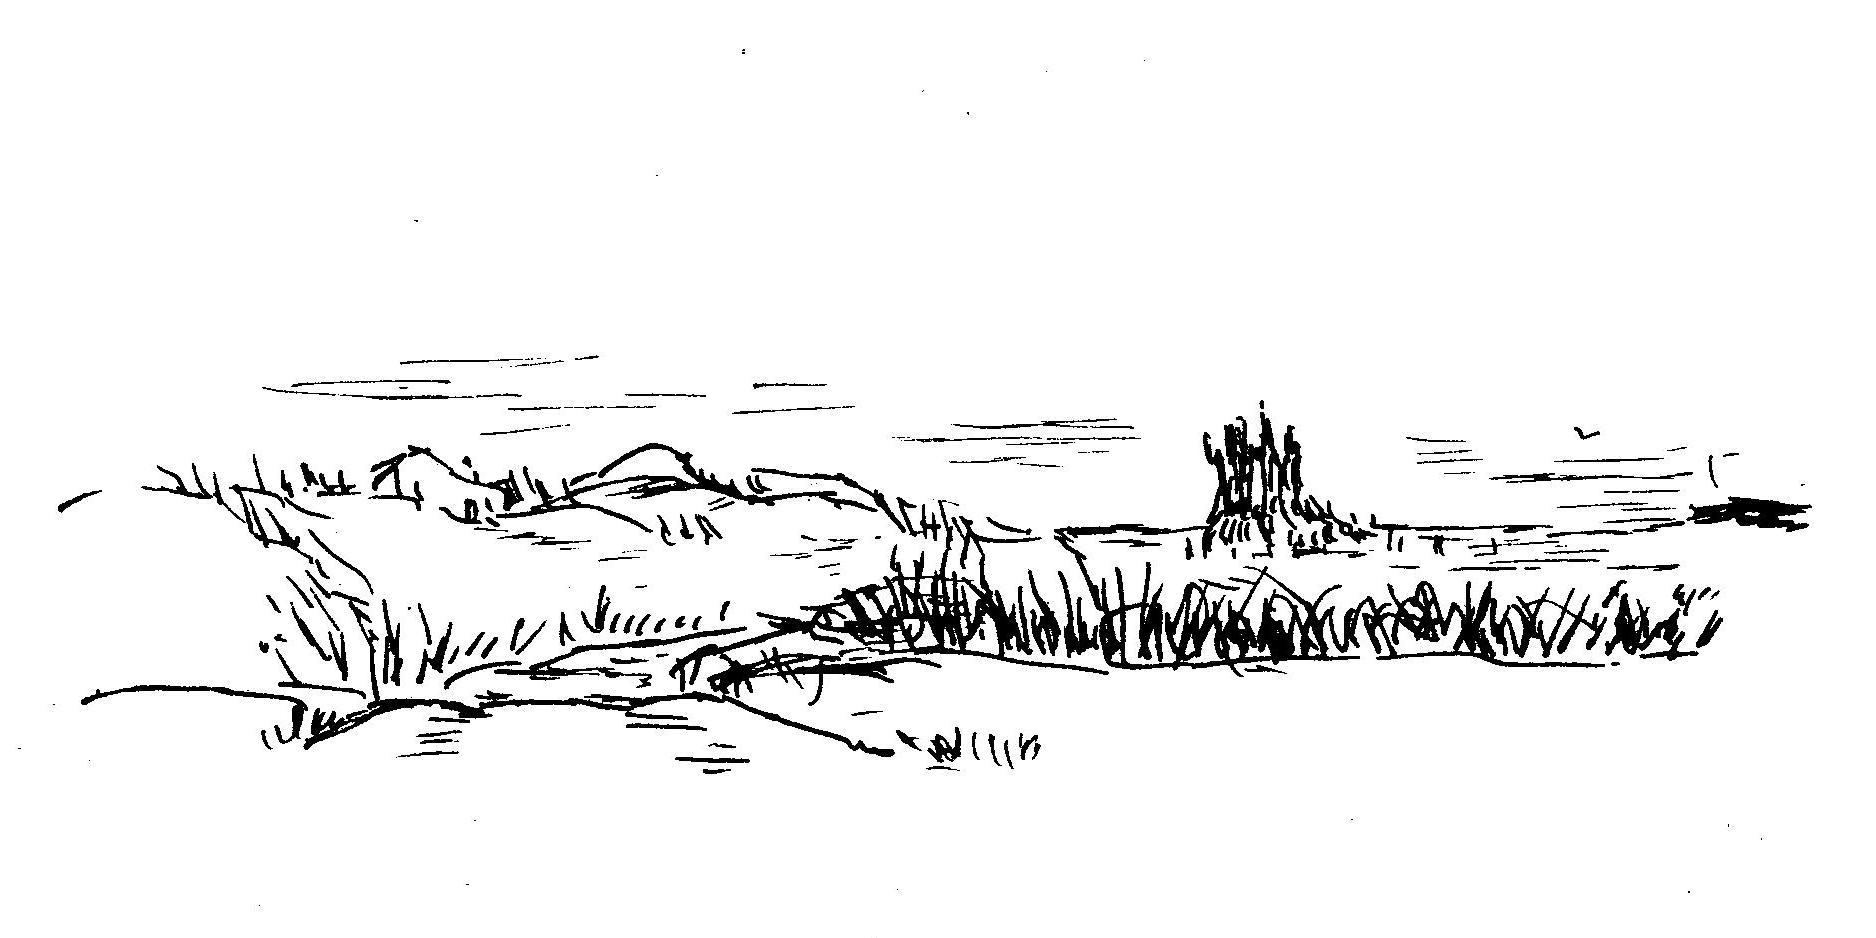 coast-road-to-marsh